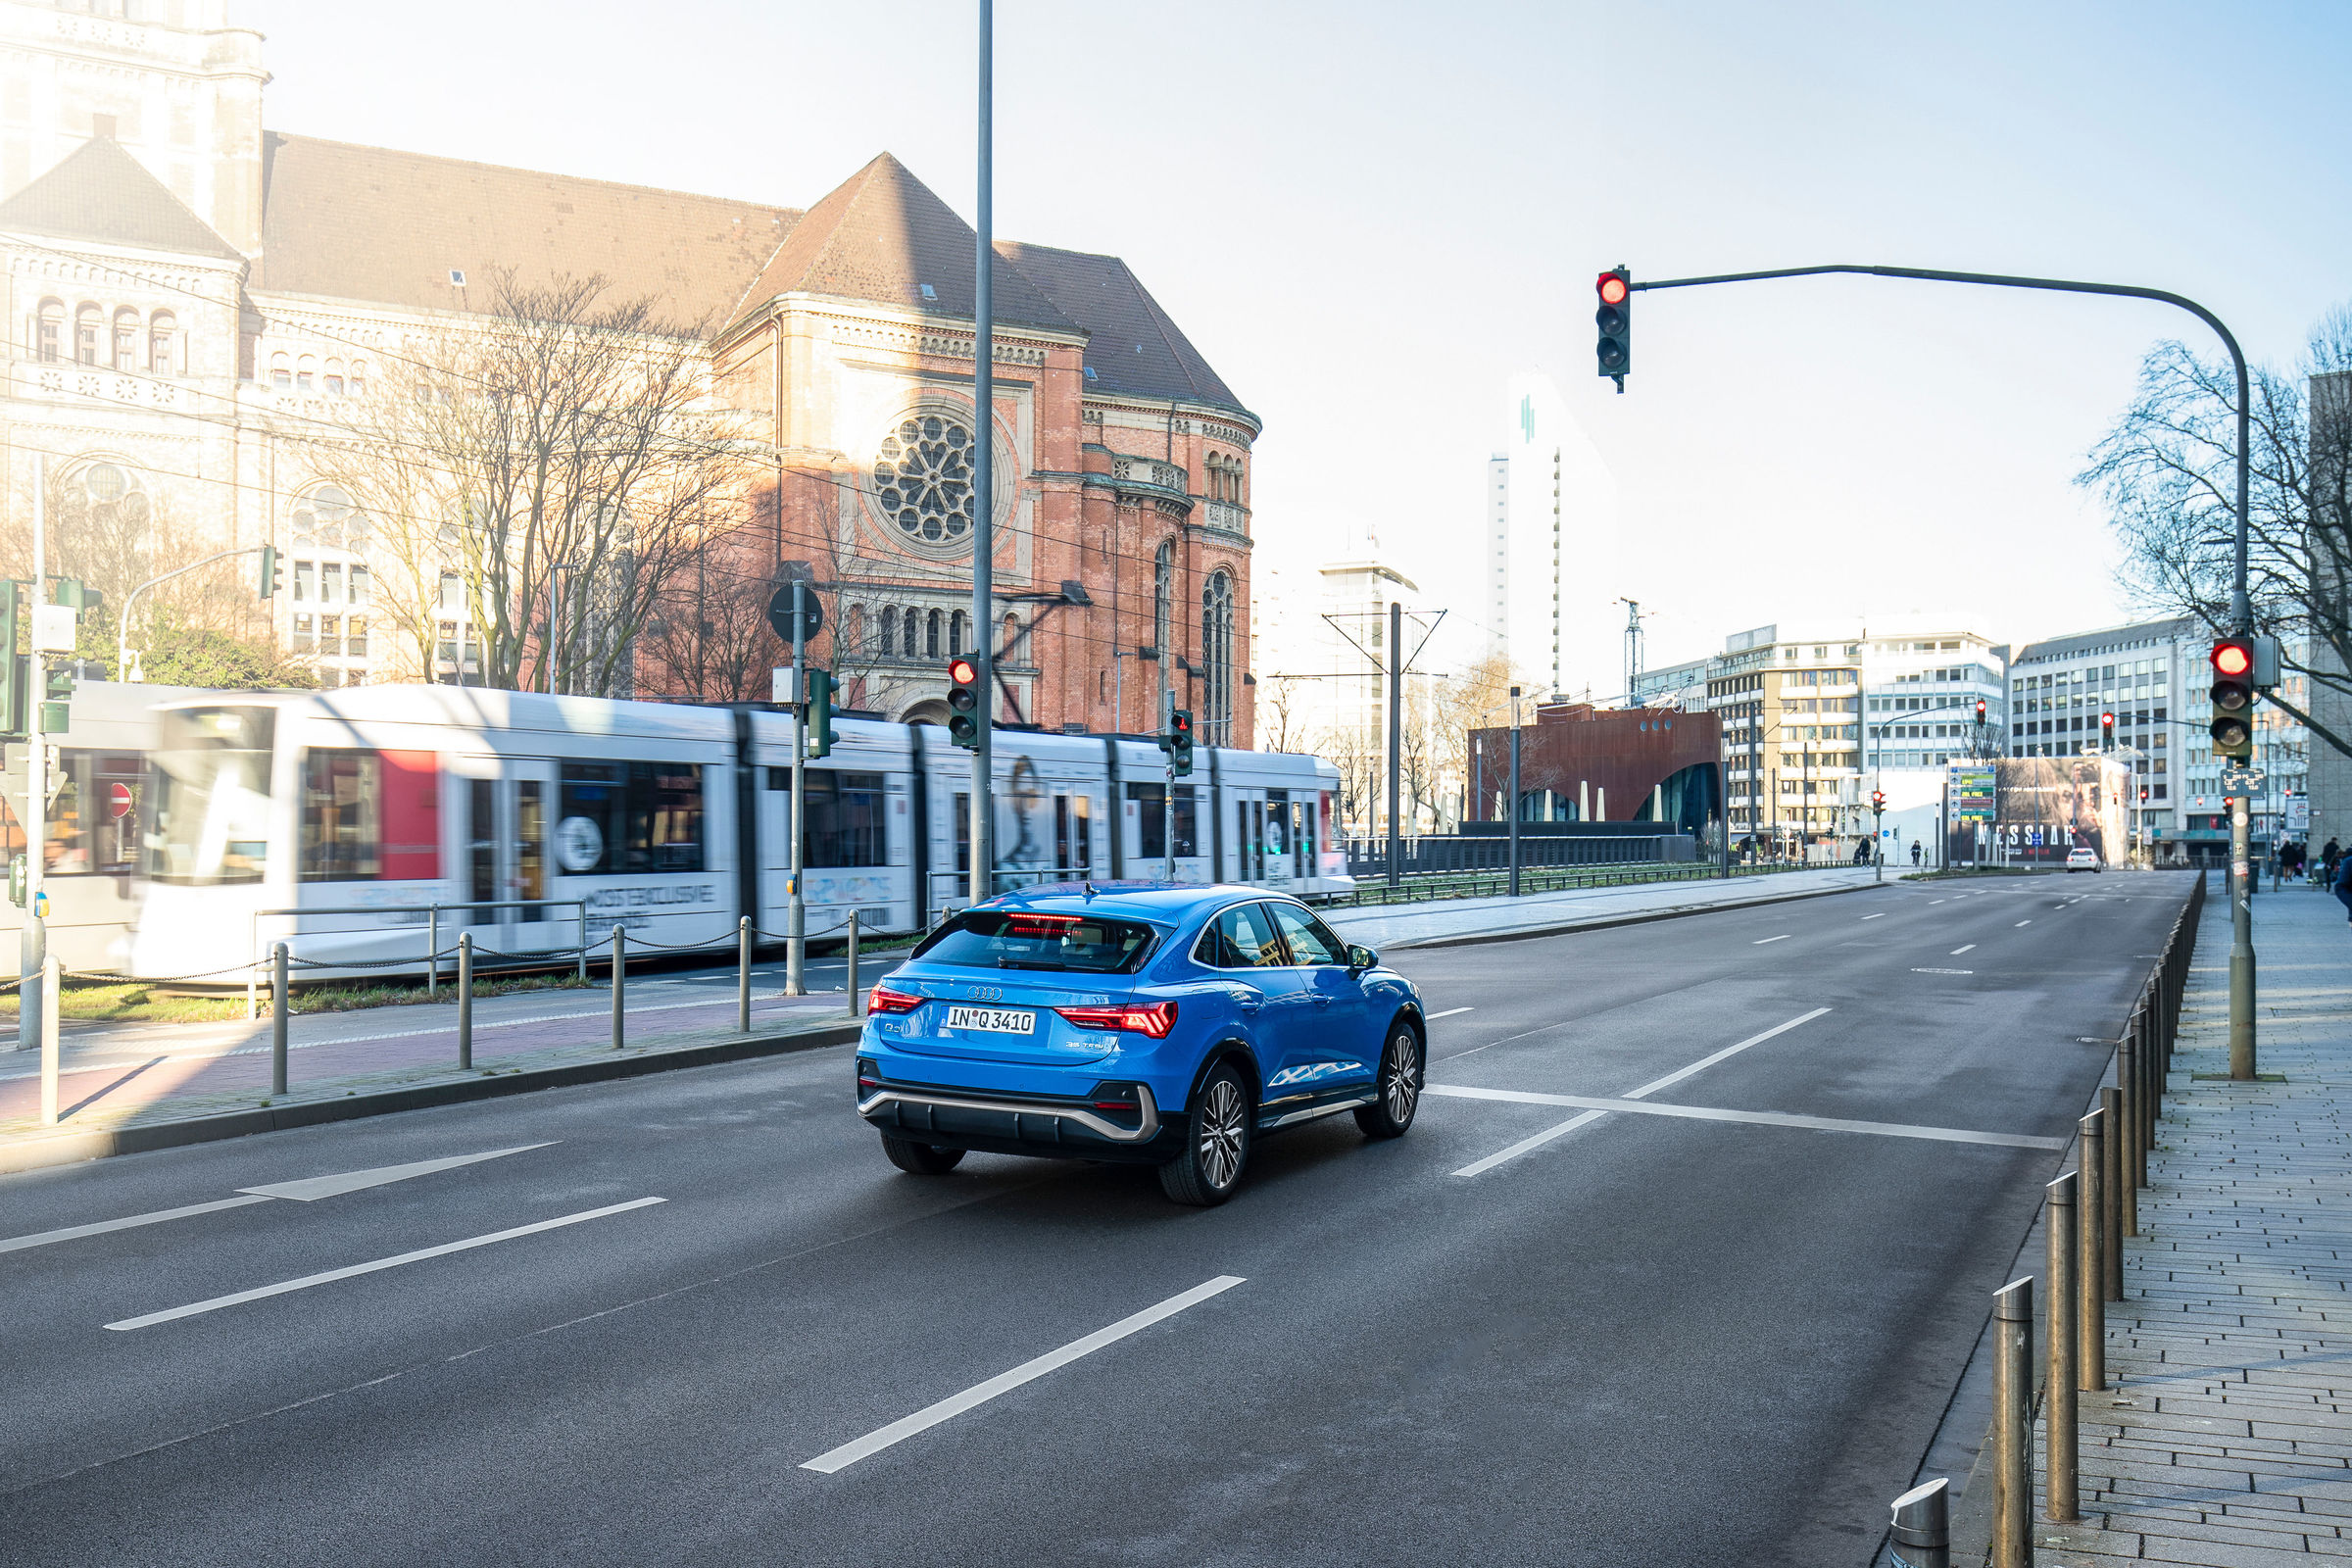 Audi networks with traffic lights in Düsseldorf - Image 1